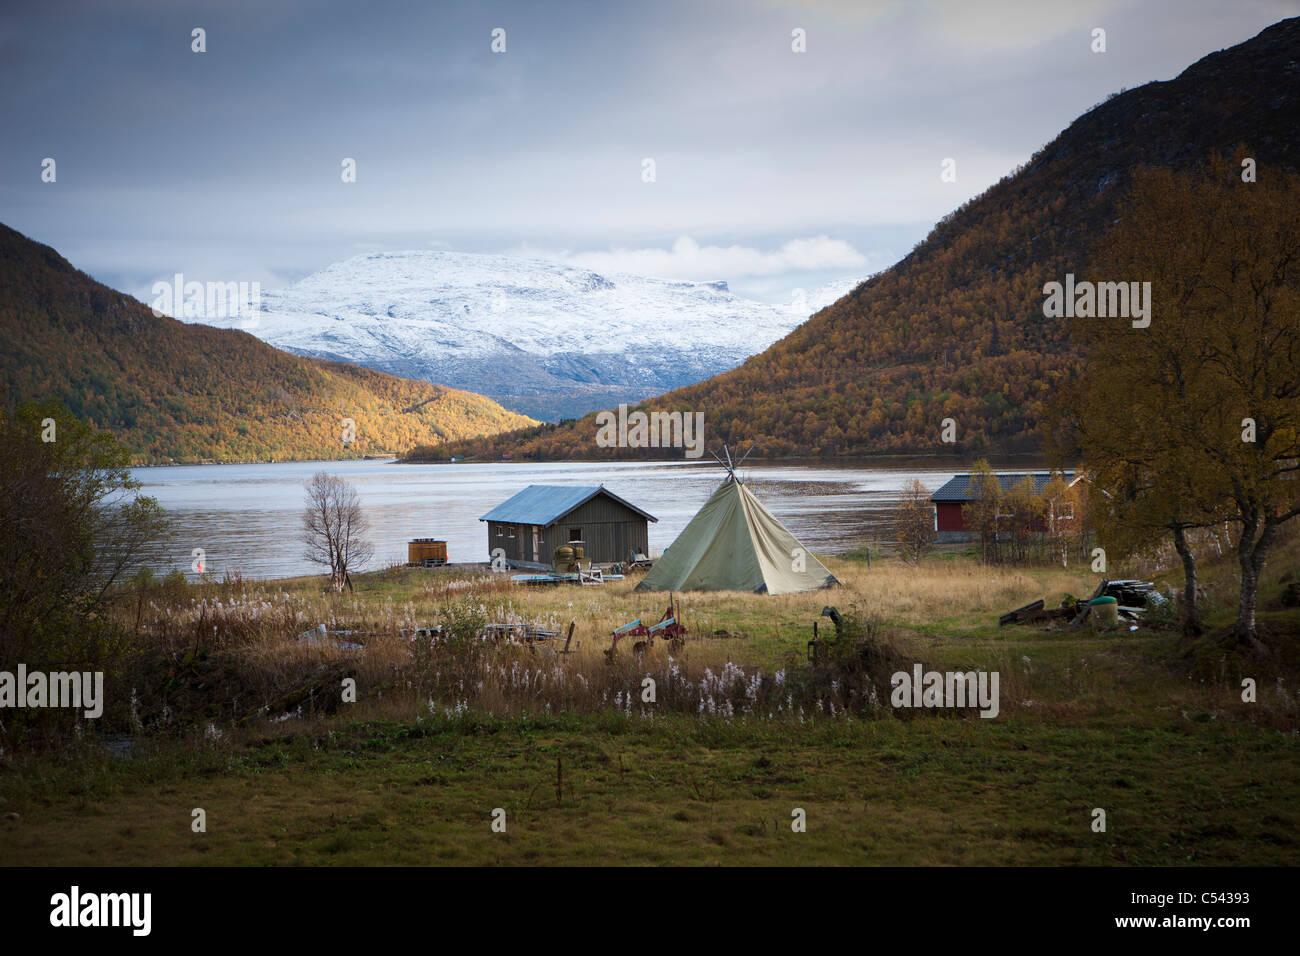 Lakeside camping - Stock Image